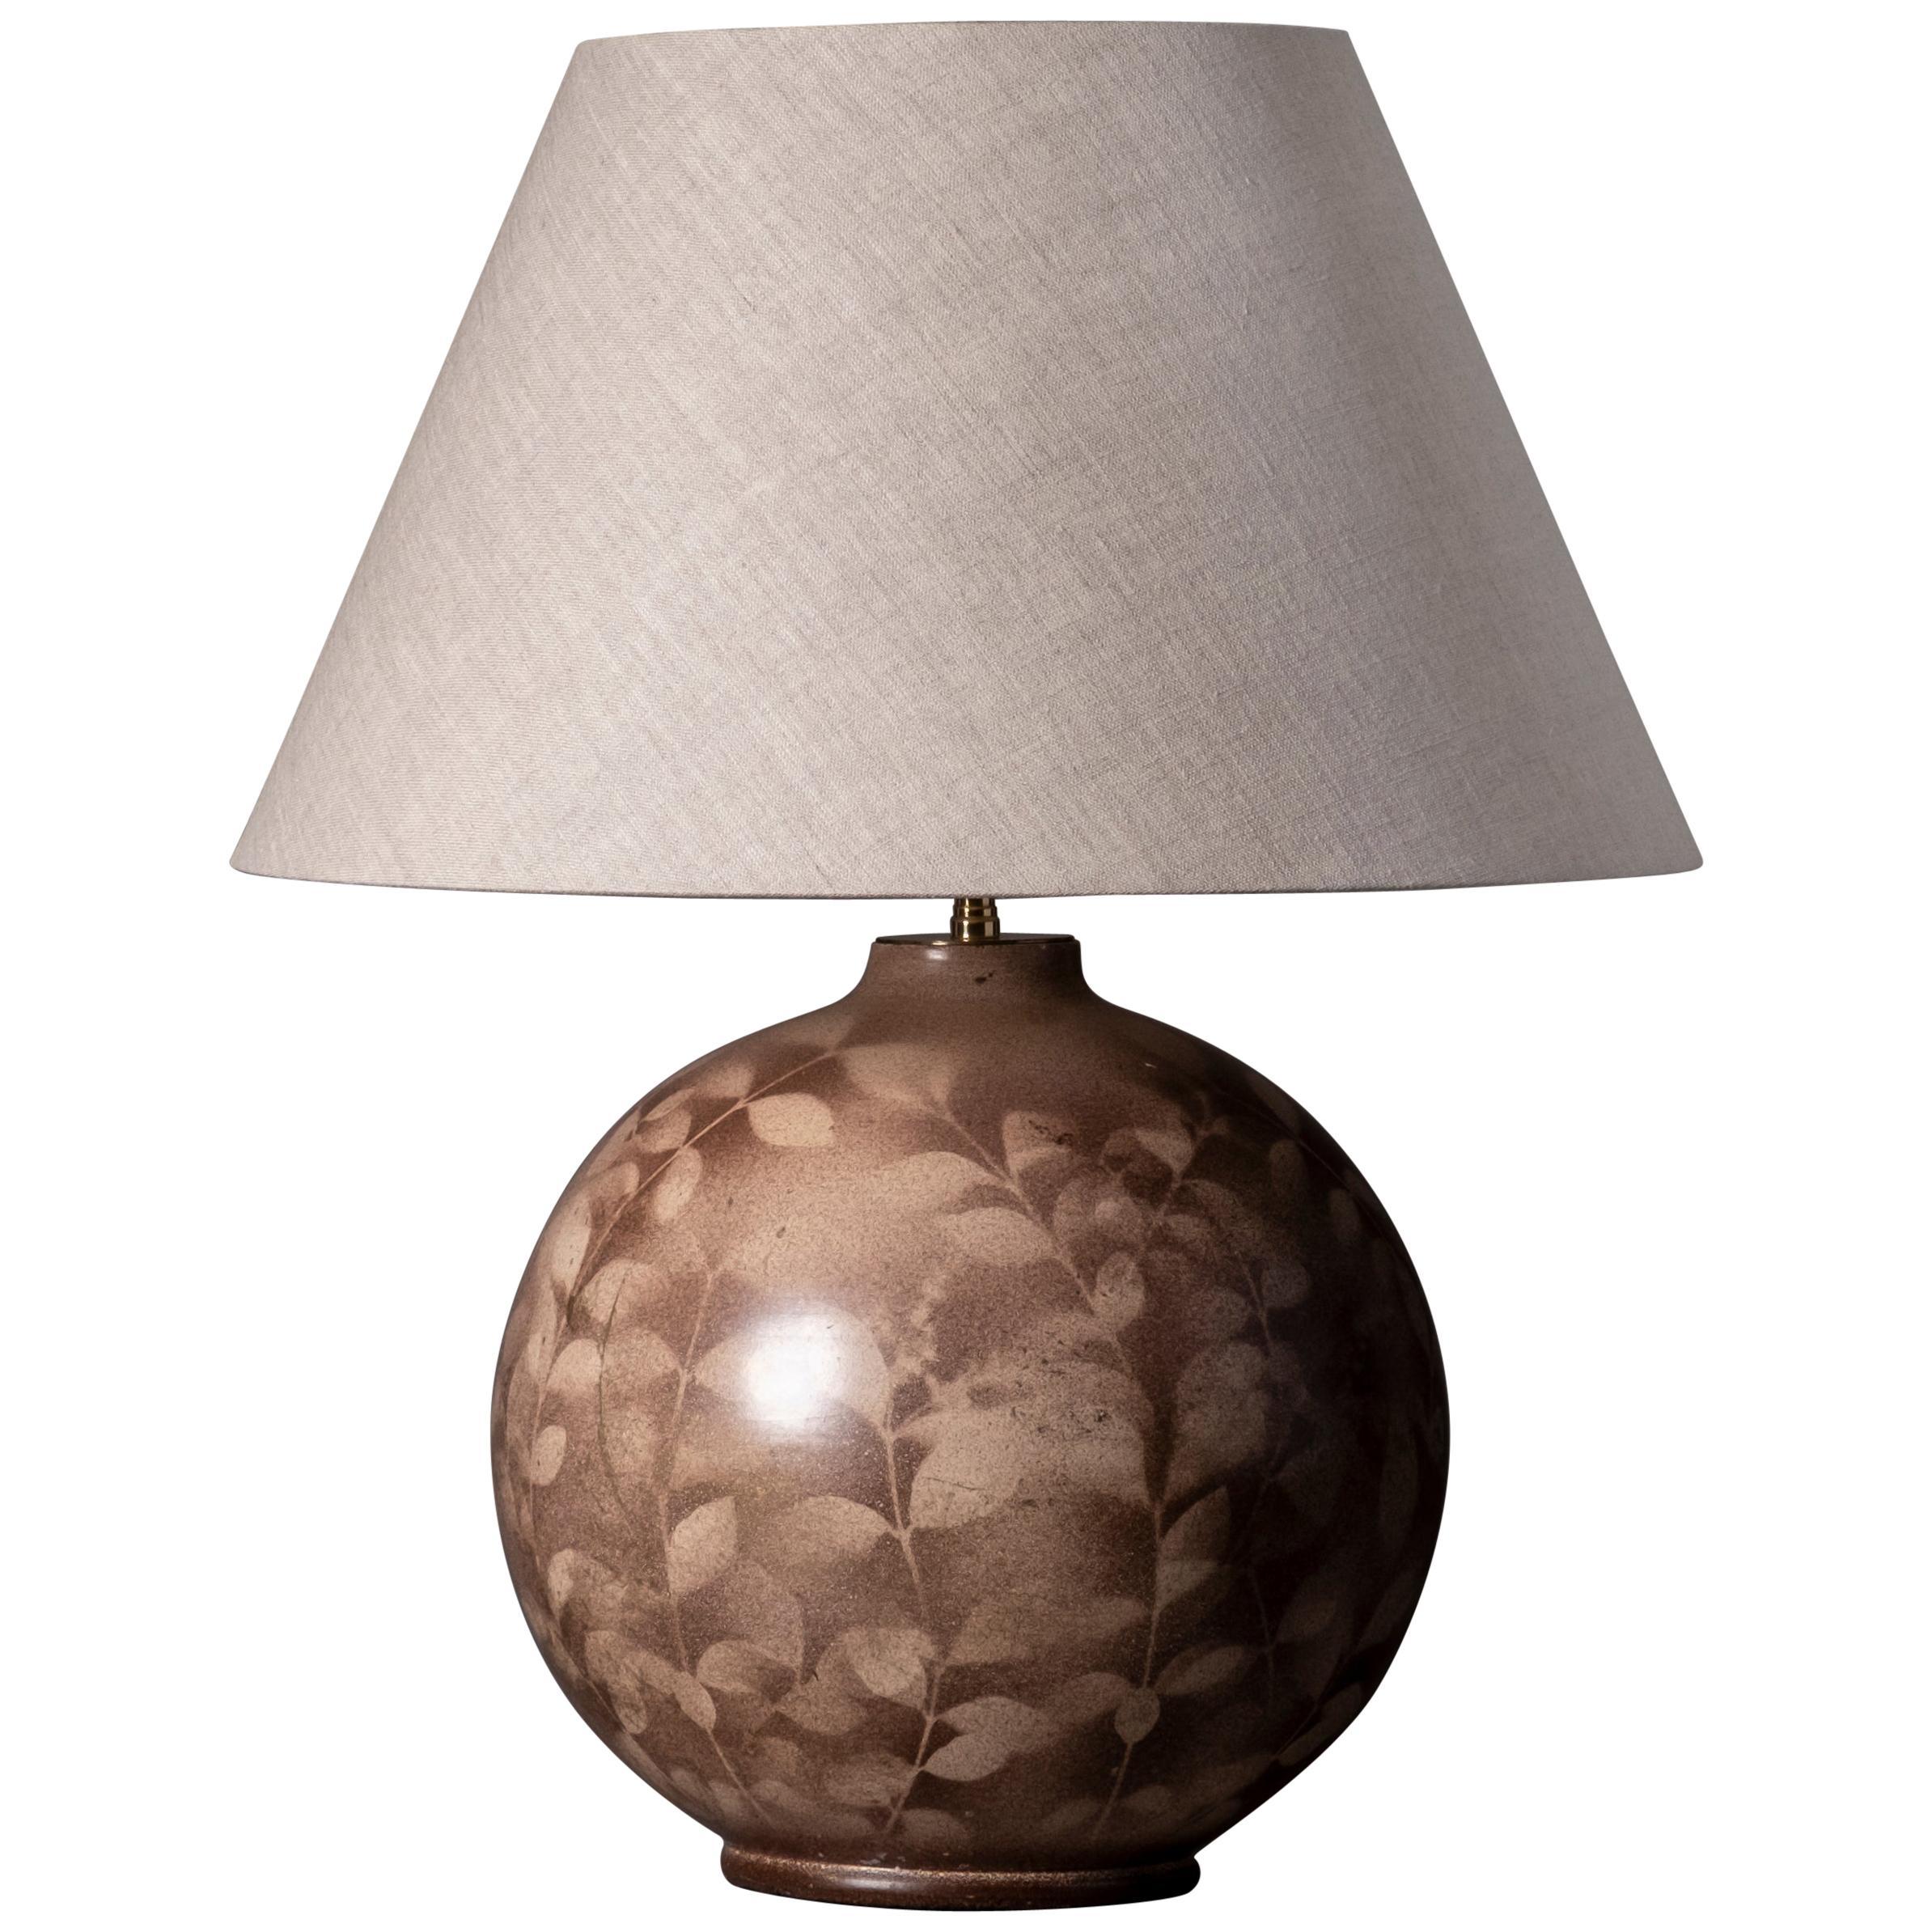 Midcentury Century Bulbous Art Vase Lamp